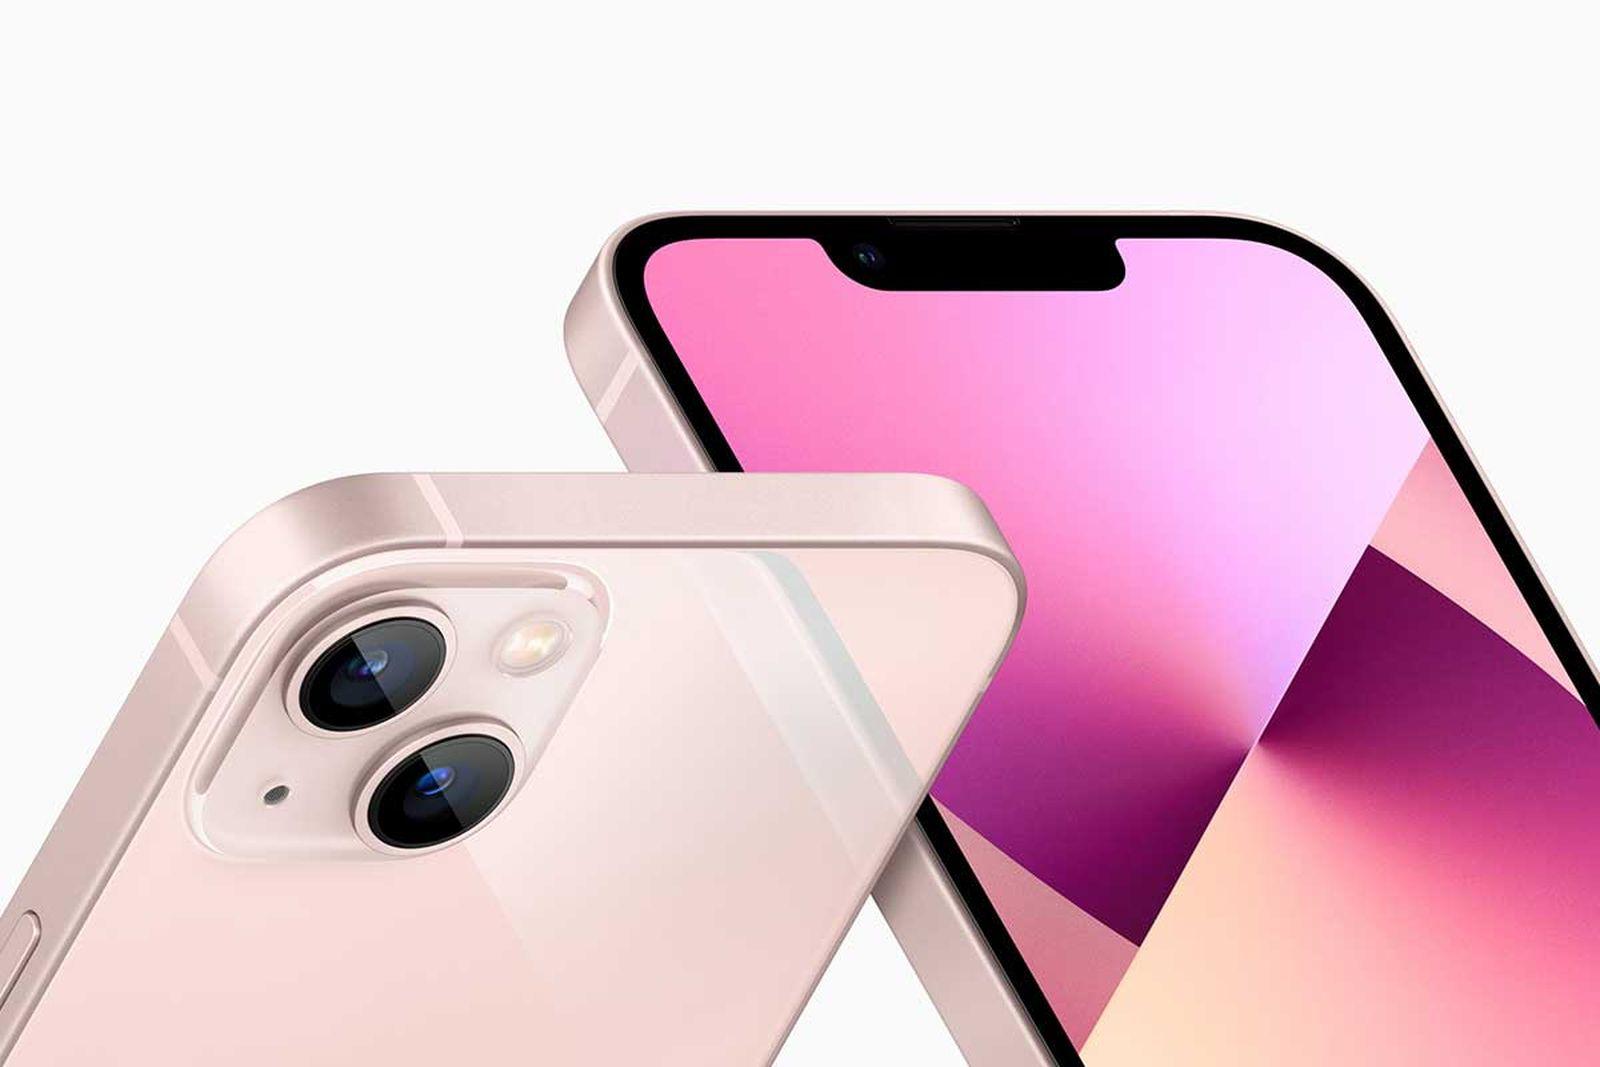 apple-iphone-13-mini-pro--(2)1